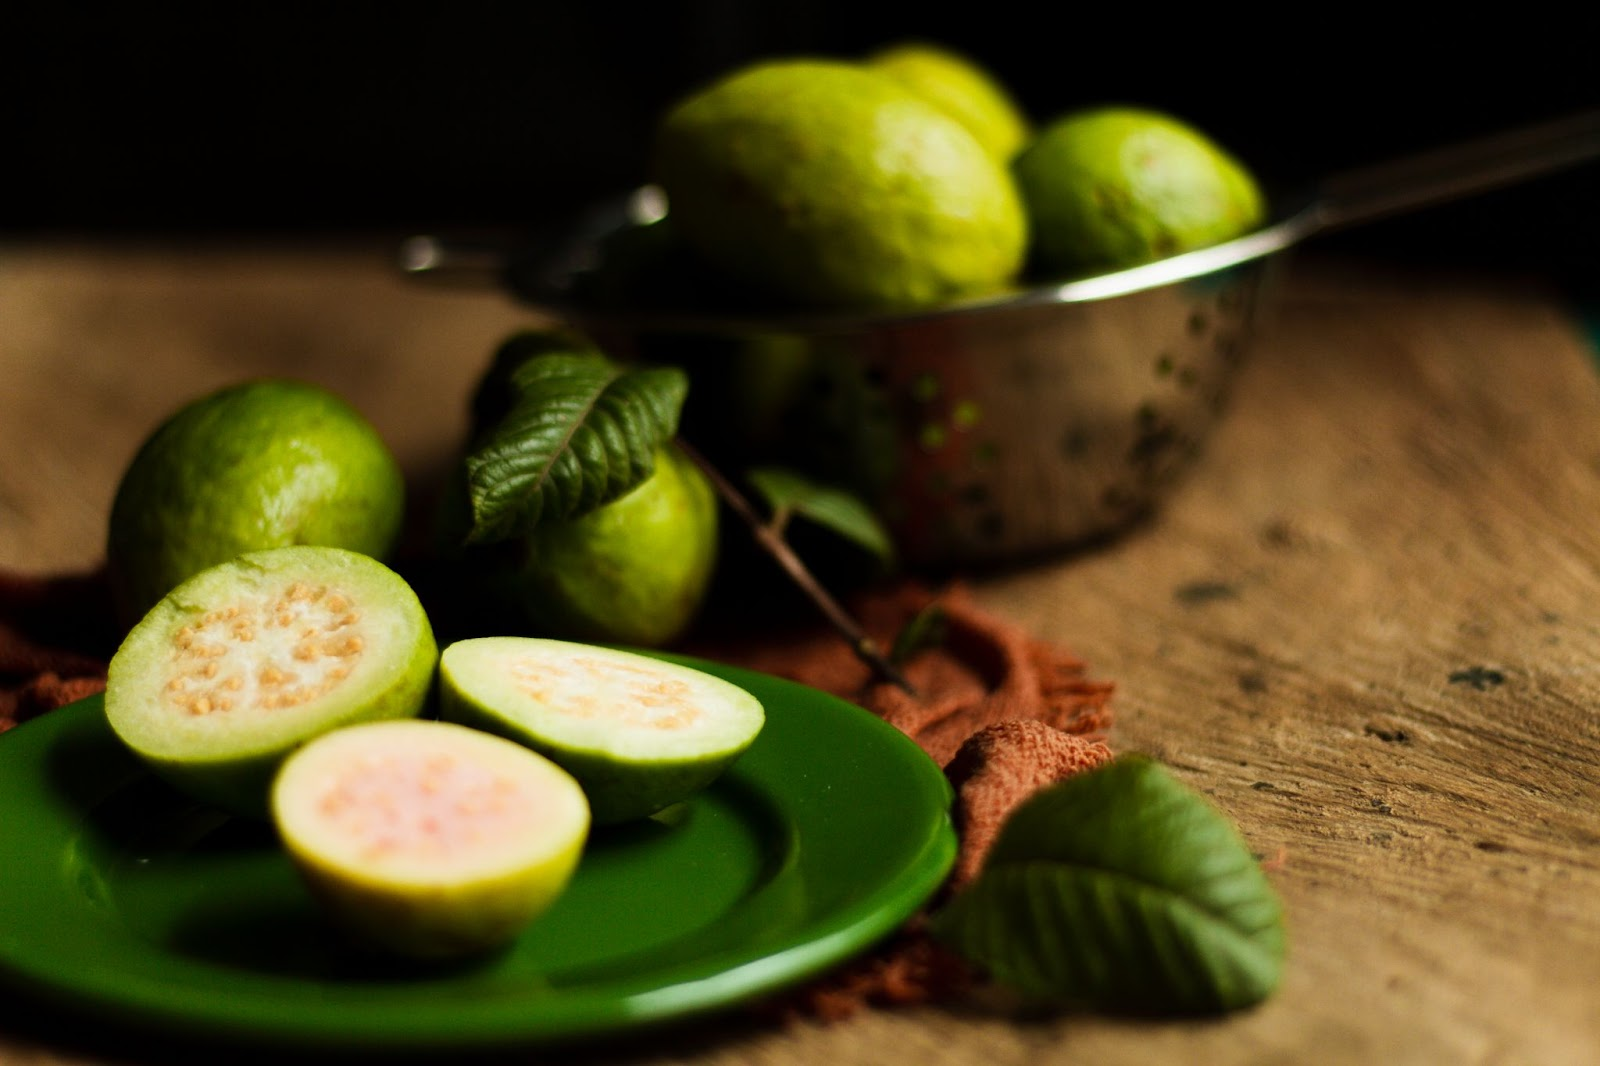 Trái ổi - Trái cây chứa nhiều collagen chống lão hóa da